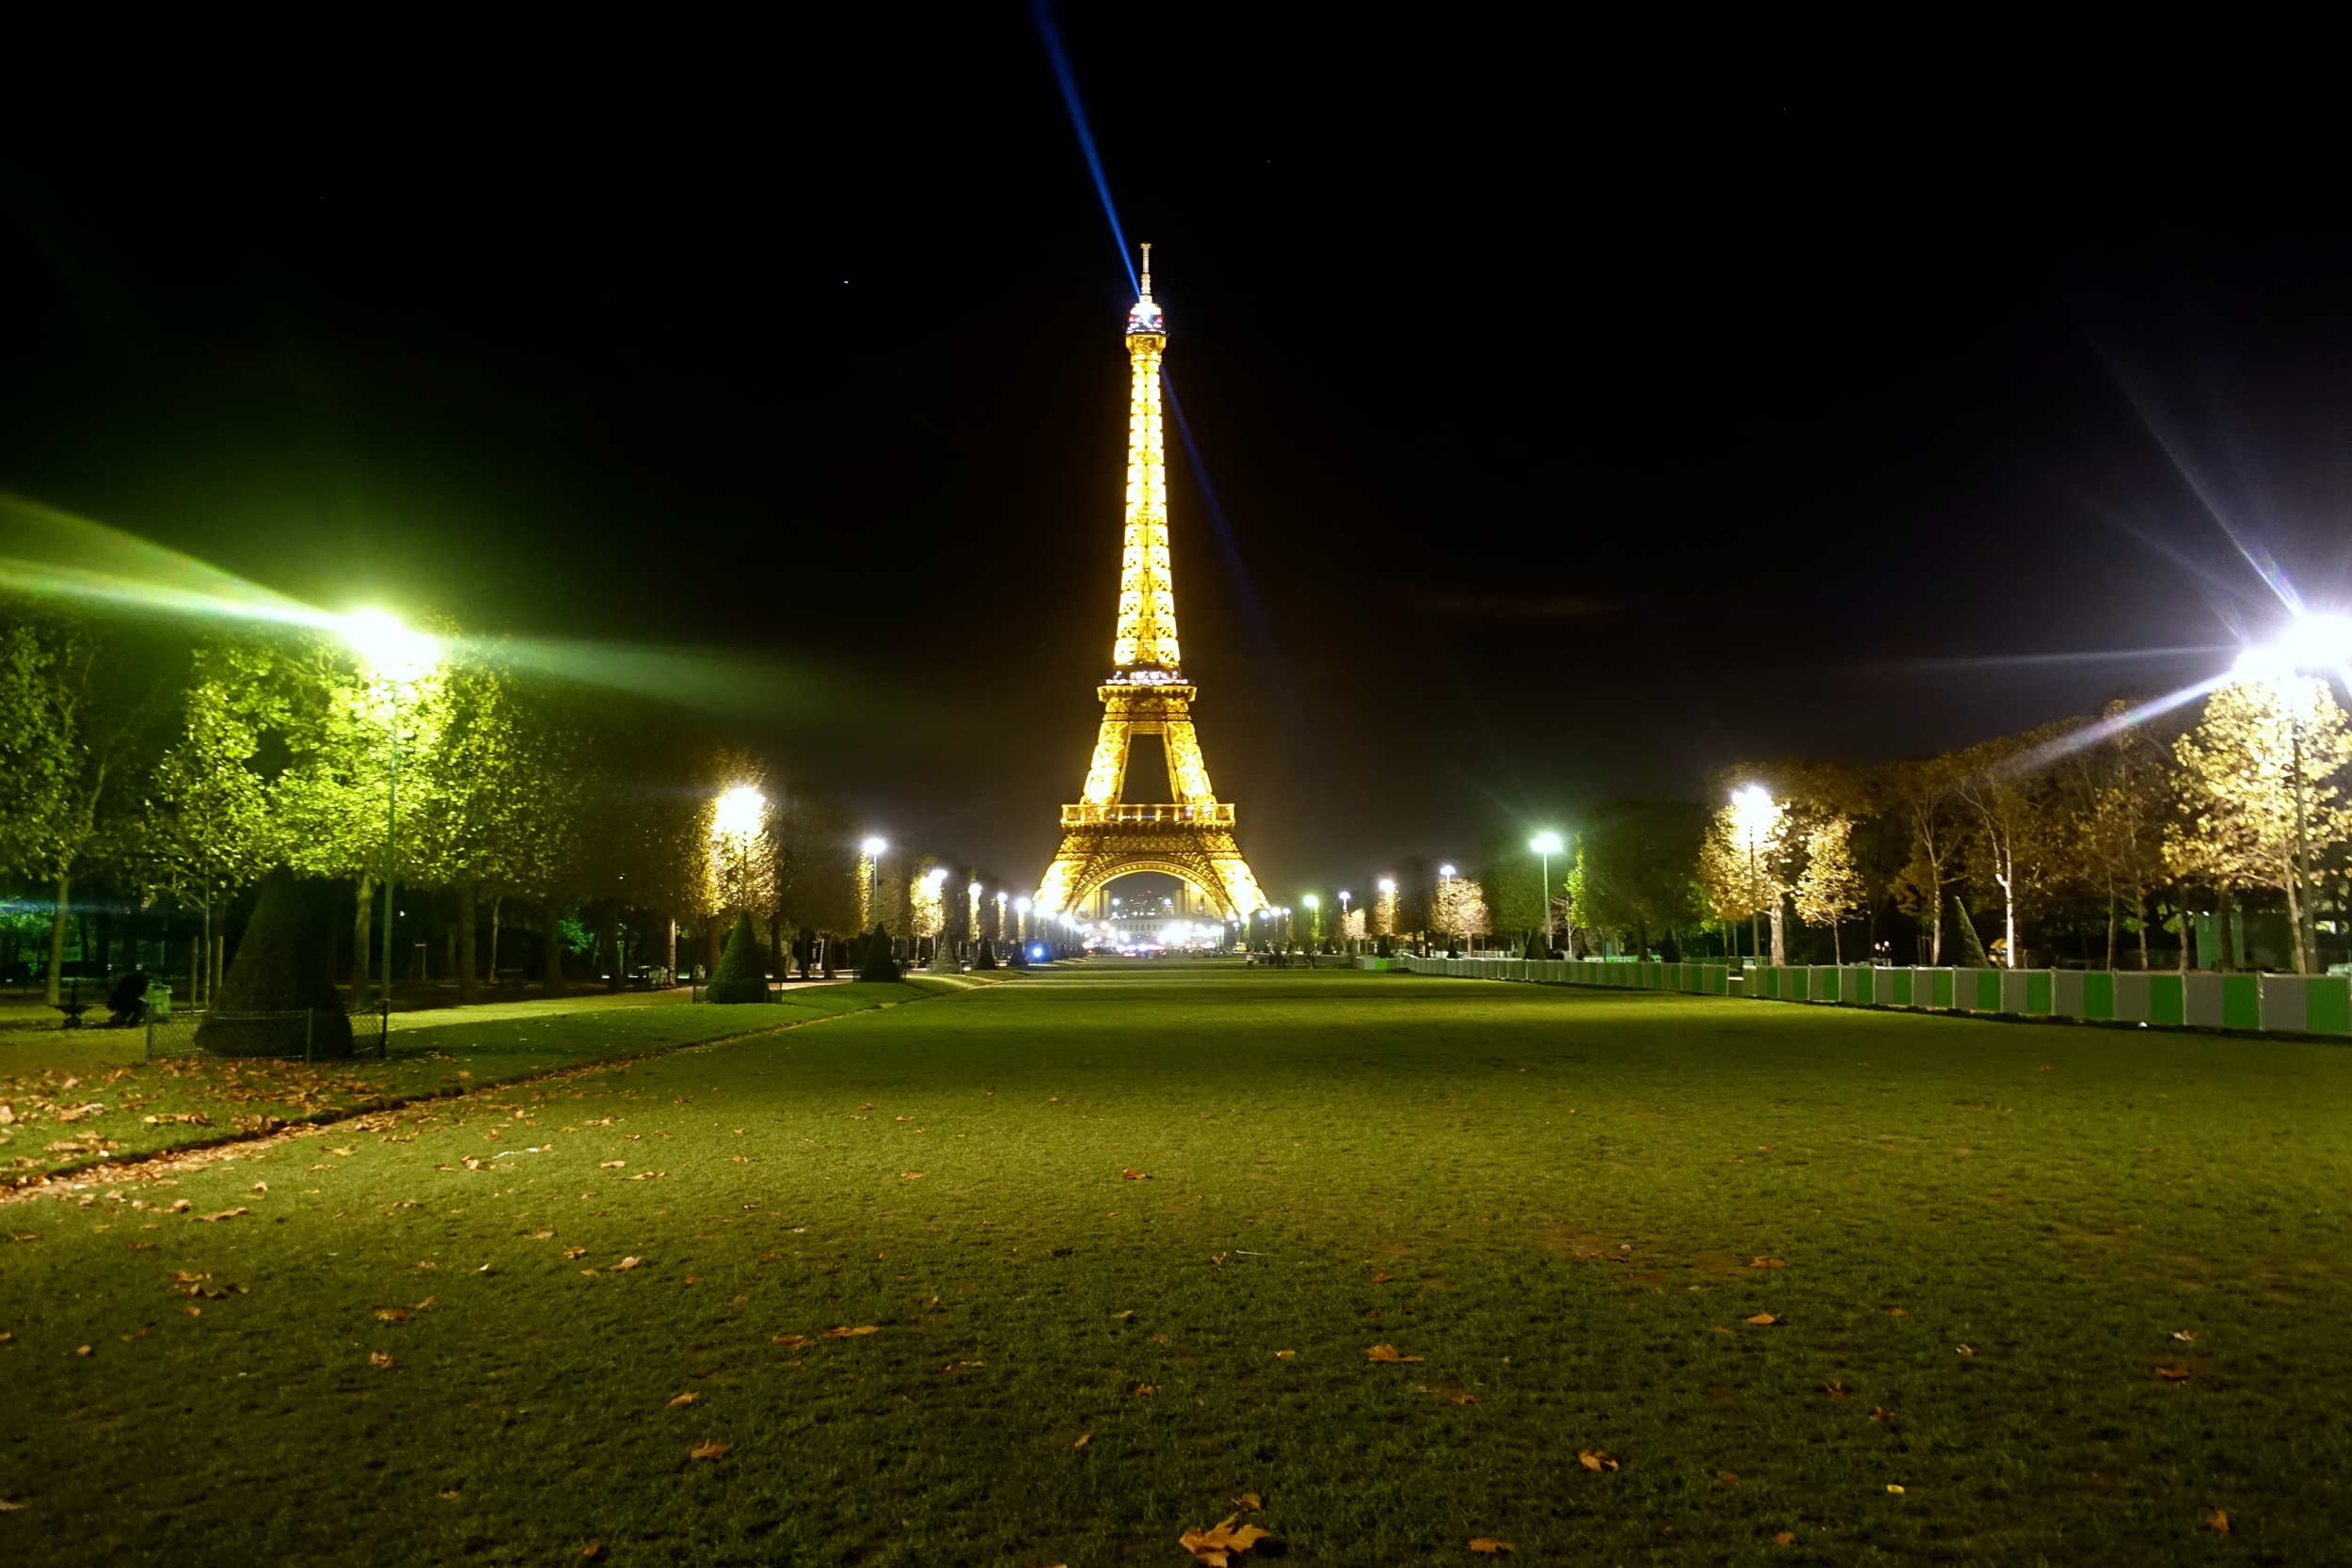 Tour Eiffel, uninterrupted // 9 November 2014, 10:43pm.